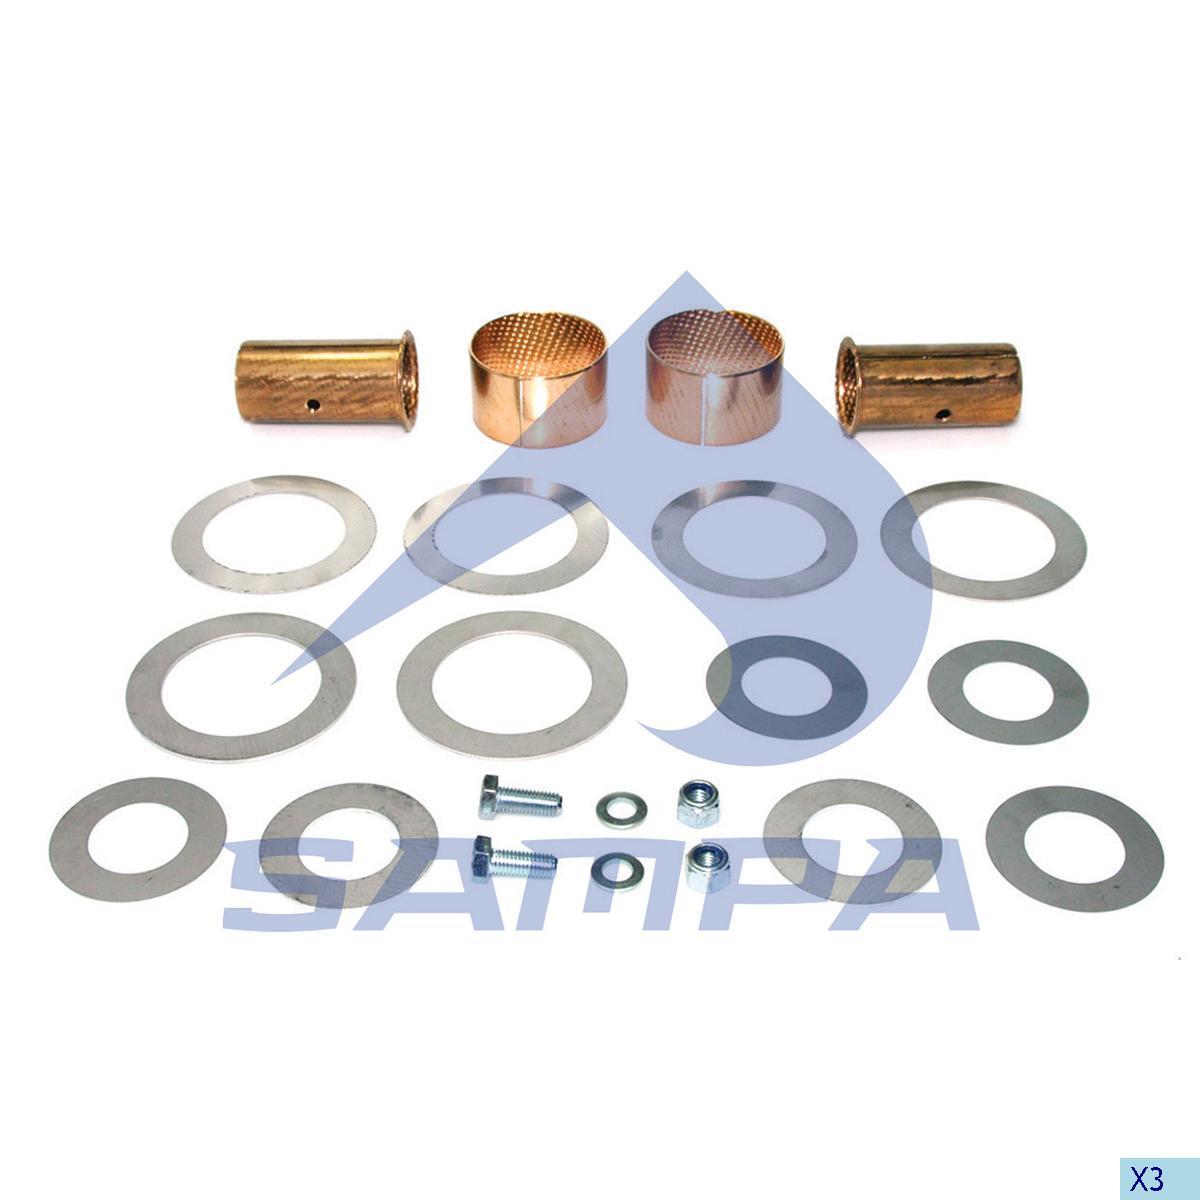 Repair Kit, Fifth Wheel, Georg Fischer, Complementary Equipment